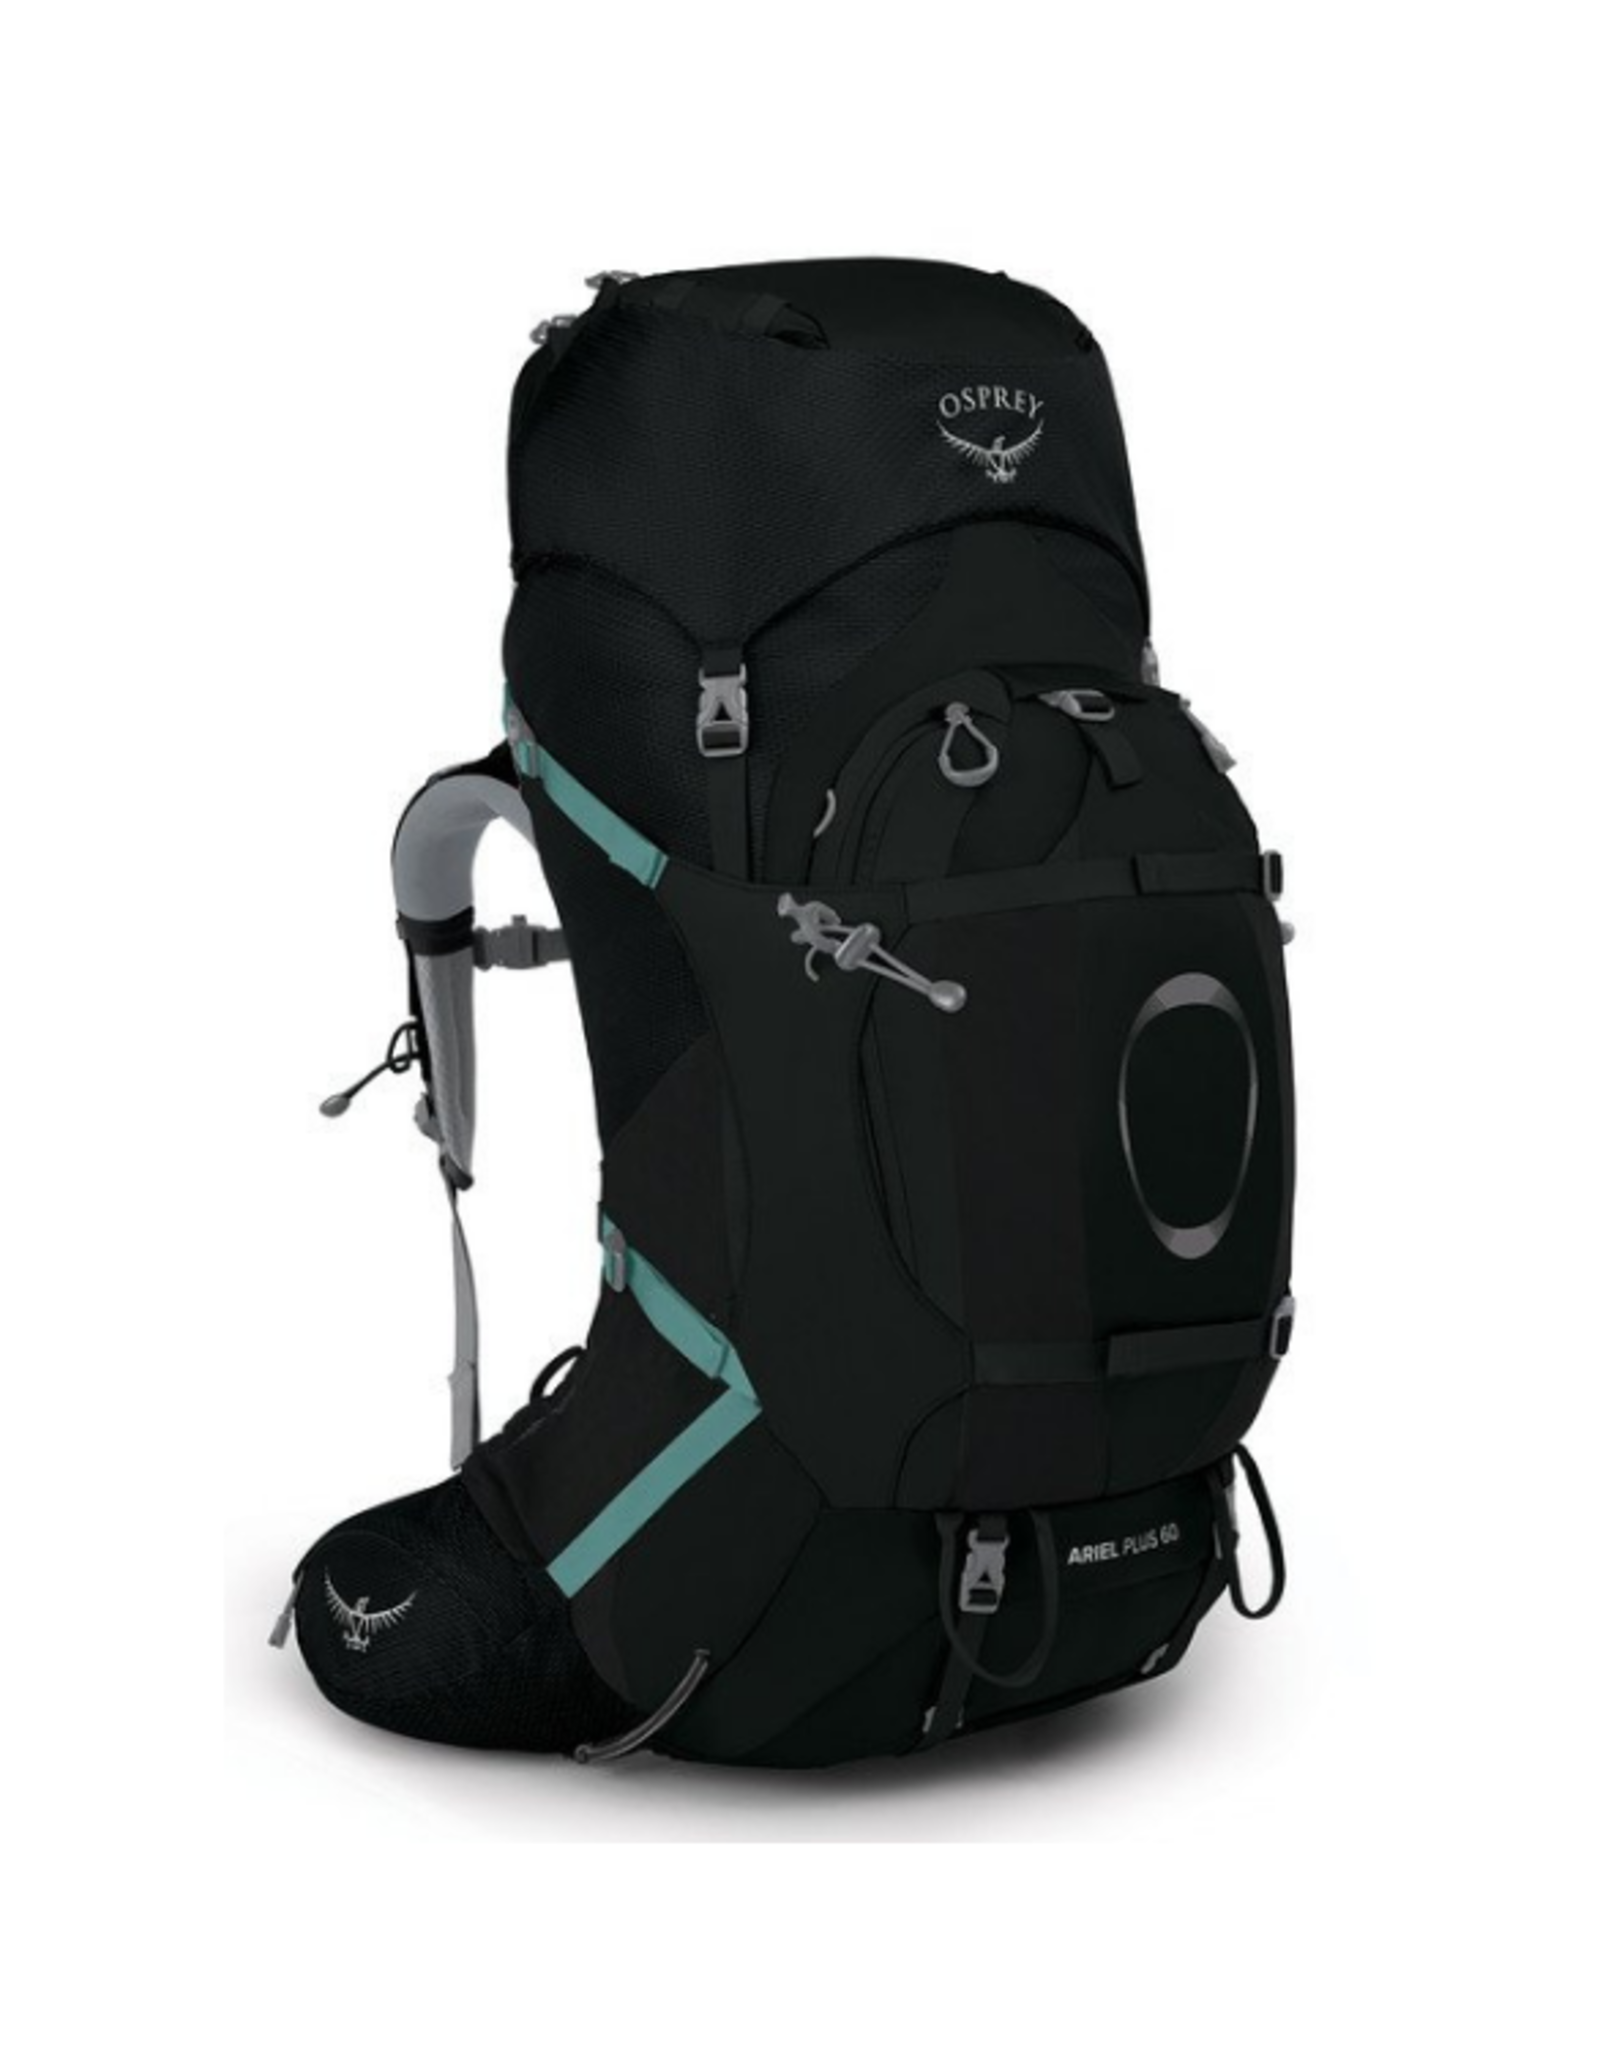 Osprey Osprey Ariel Plus 60 W's Backpacking Pack